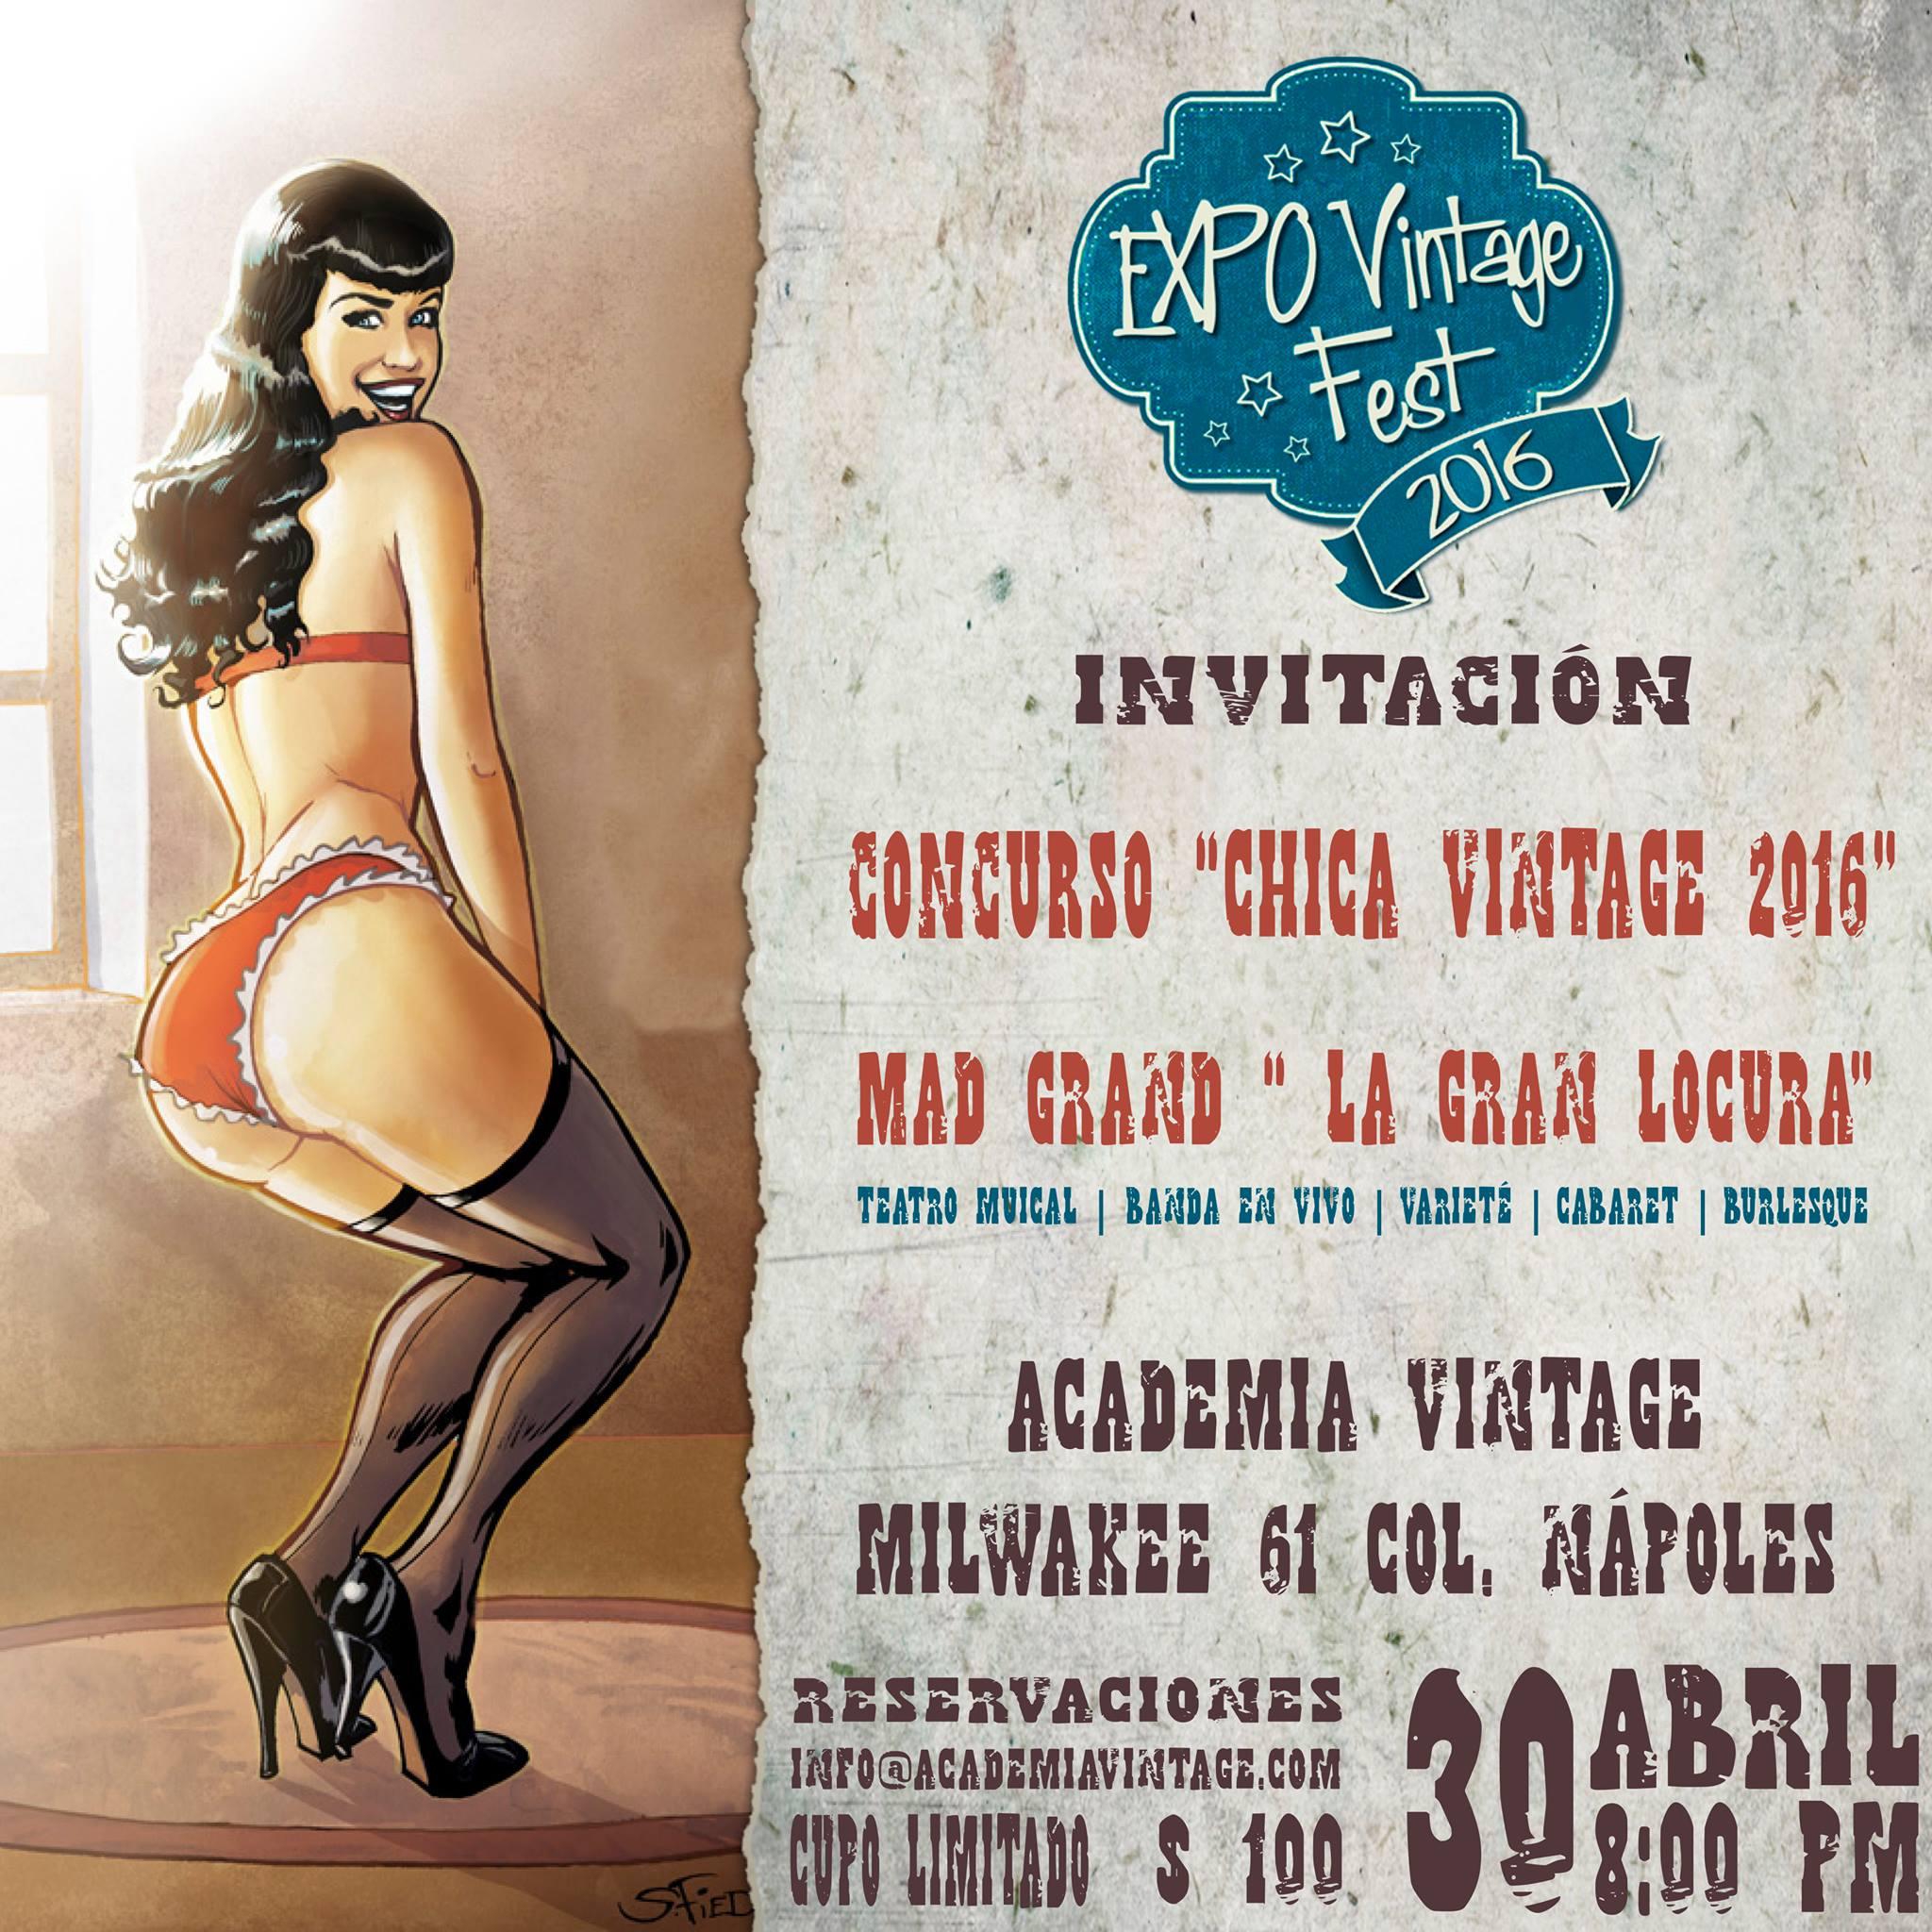 Expo VIntage